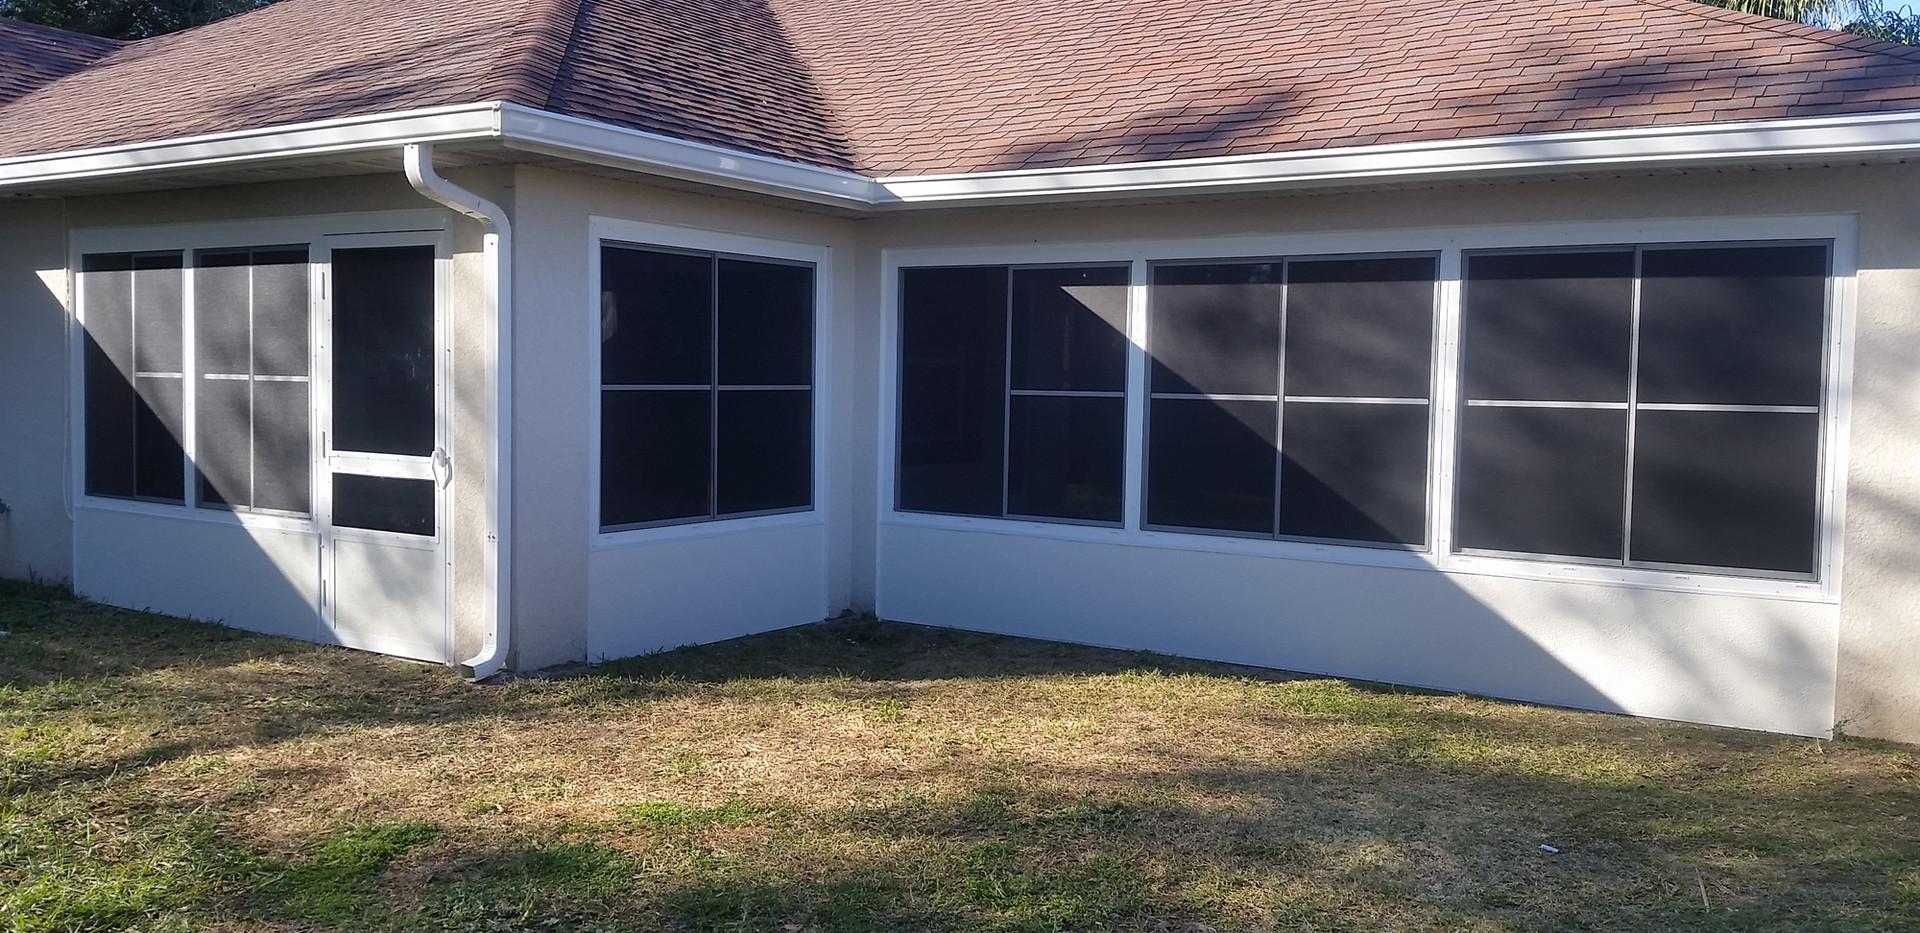 Enclosed lanai with windows